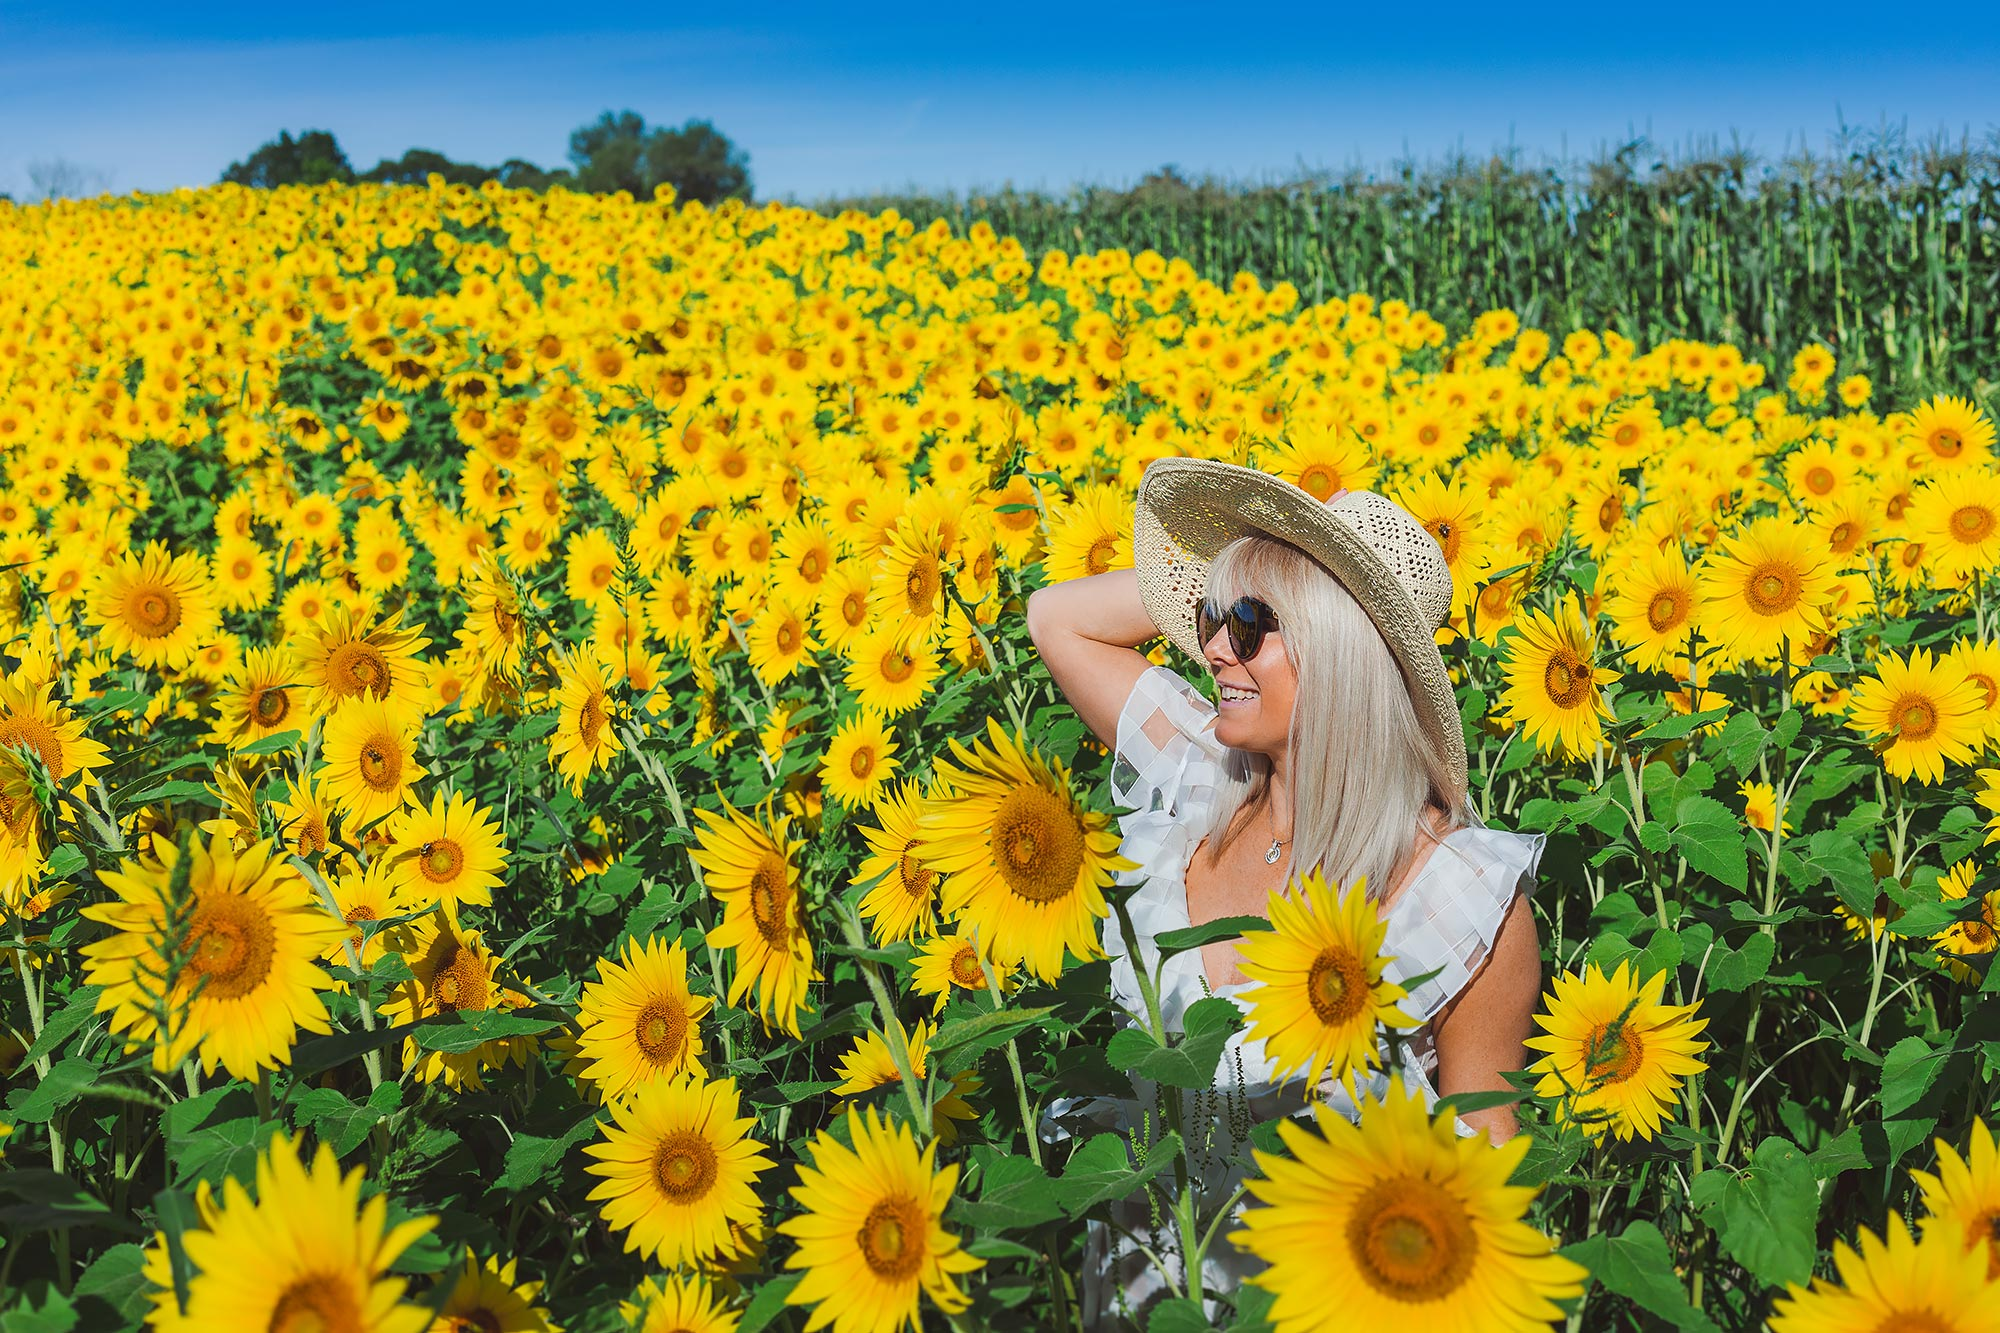 colby-farm-sunflowers-portrait-stephen-grant-photography.jpg